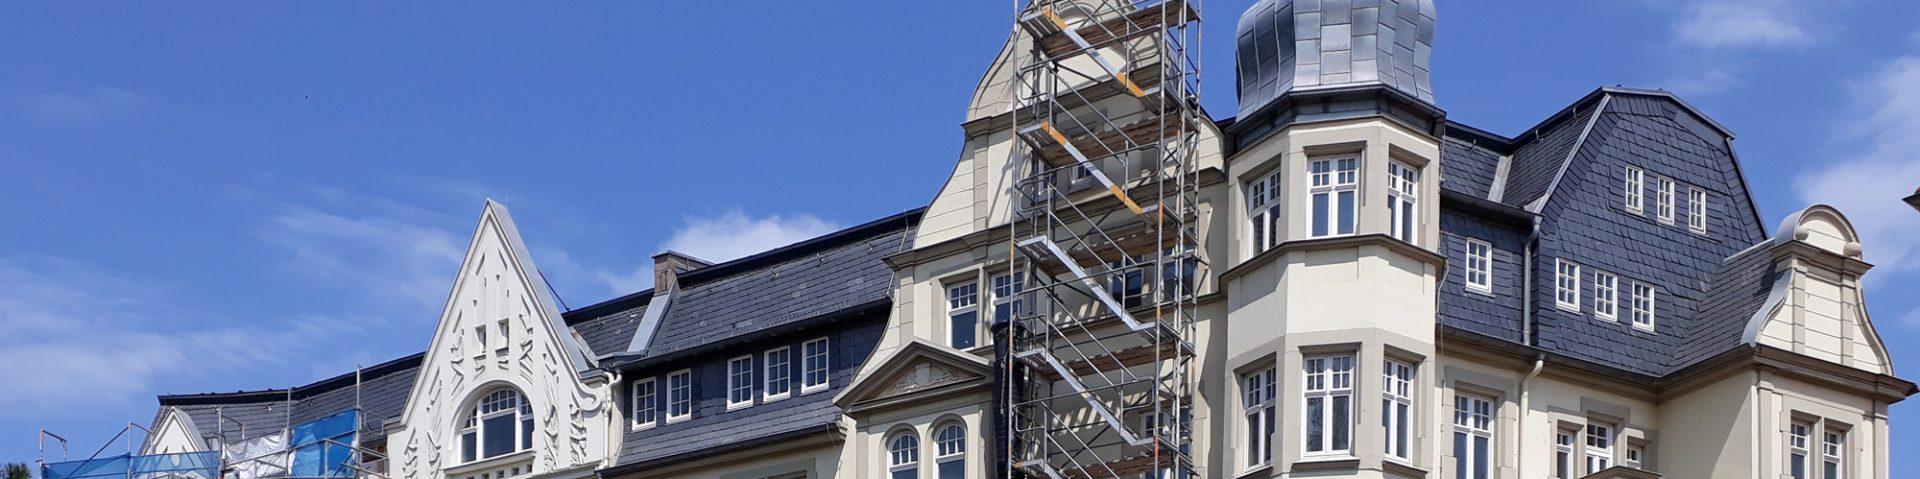 HEYX Engineering | Projektsteuerung-Bauüberwachung-Beratung